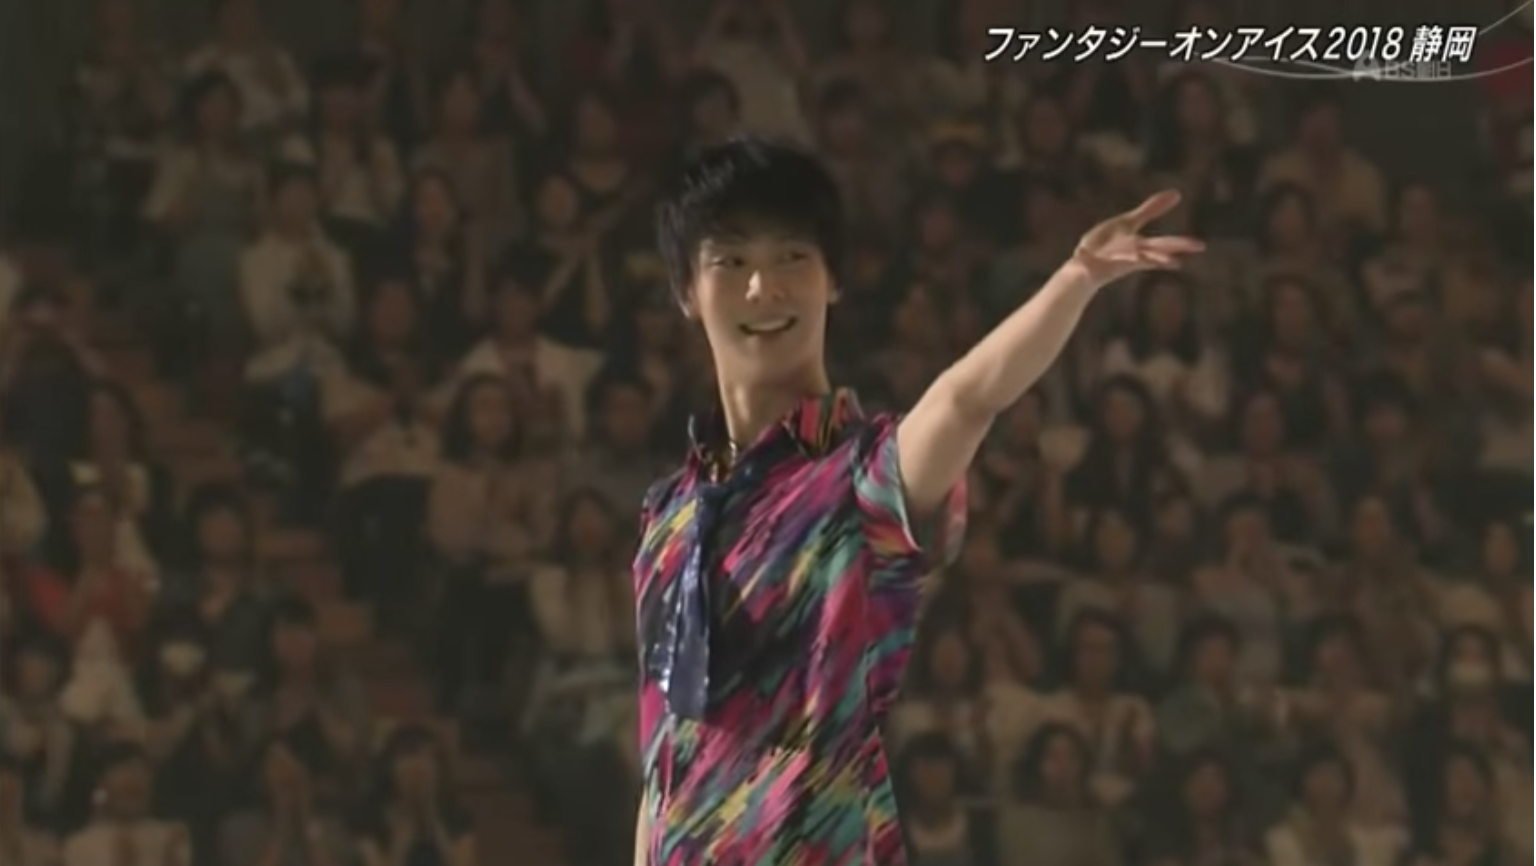 Fantasy on Ice 静岡公演 7月1日放送分の動画まとめ!